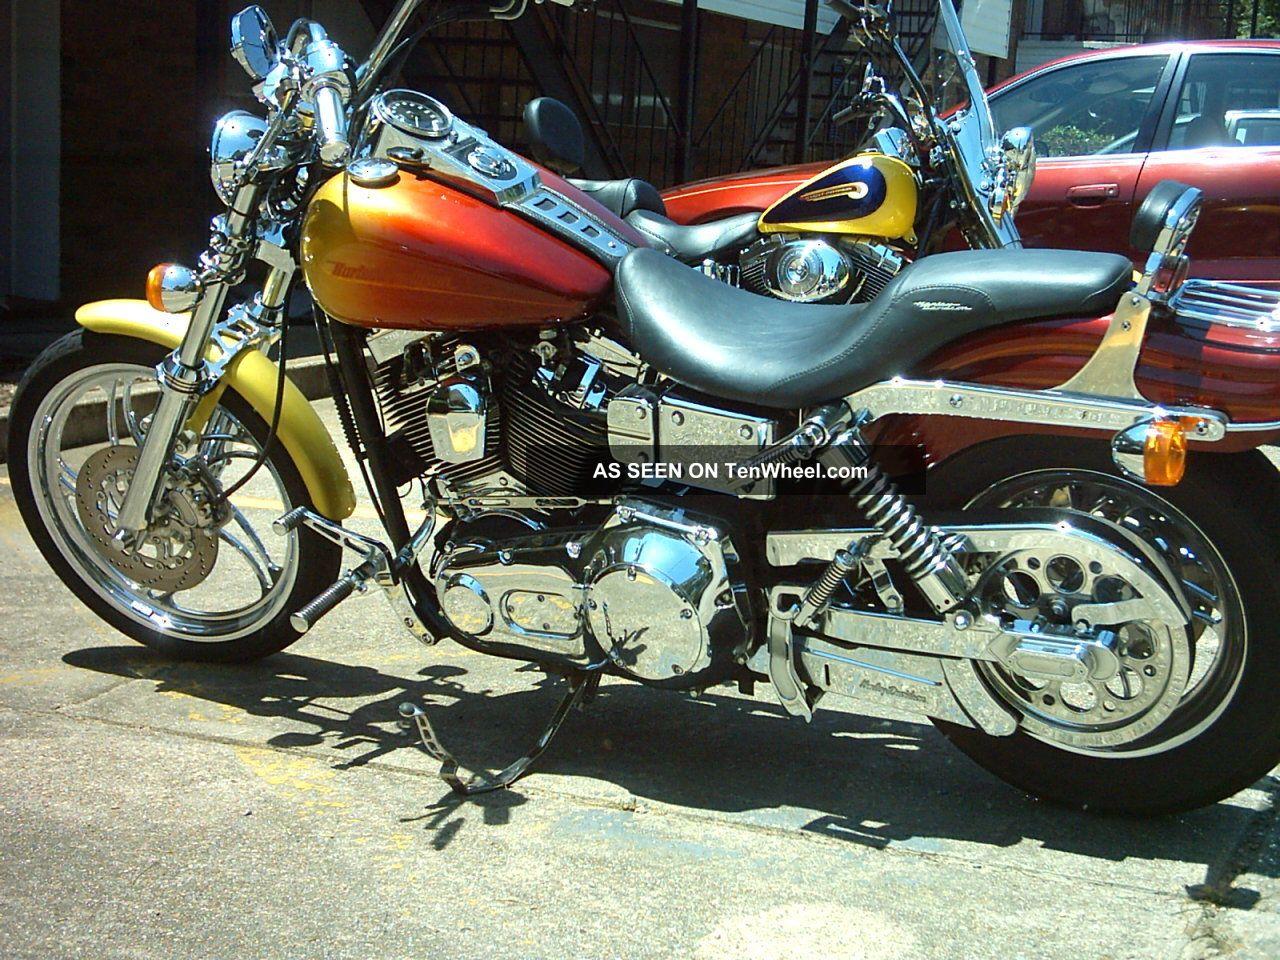 2000 Harley Davidson Dyna Wide Glide (fxdwg) Dyna photo